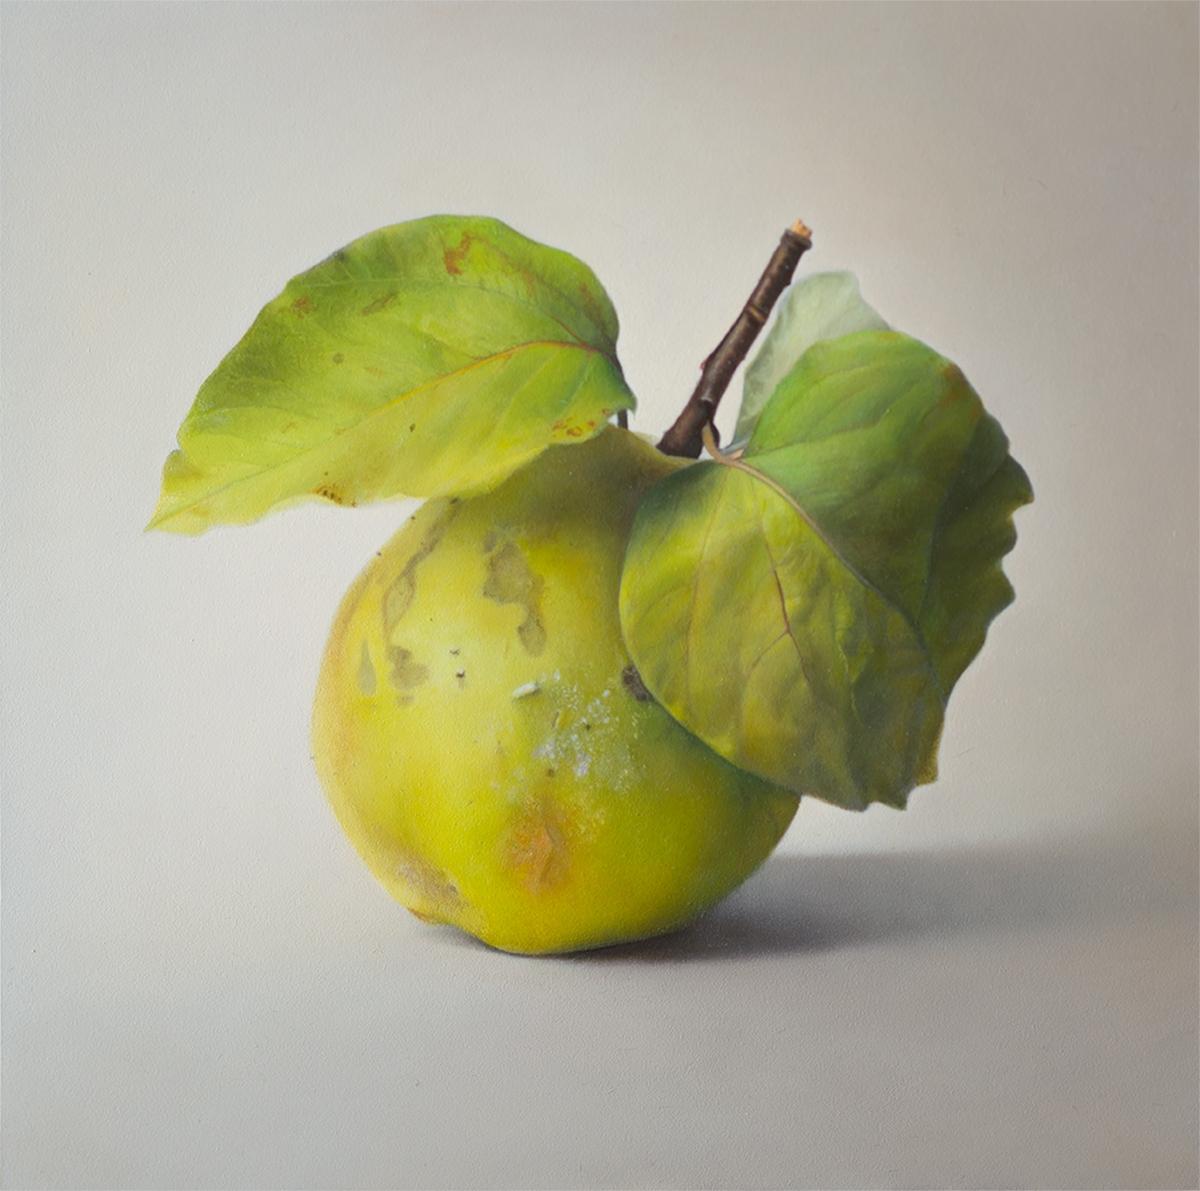 Quitte 07 © Diethard Sohn 2016 Acryl auf Leinwand 30 x 30 cm (verkauft)